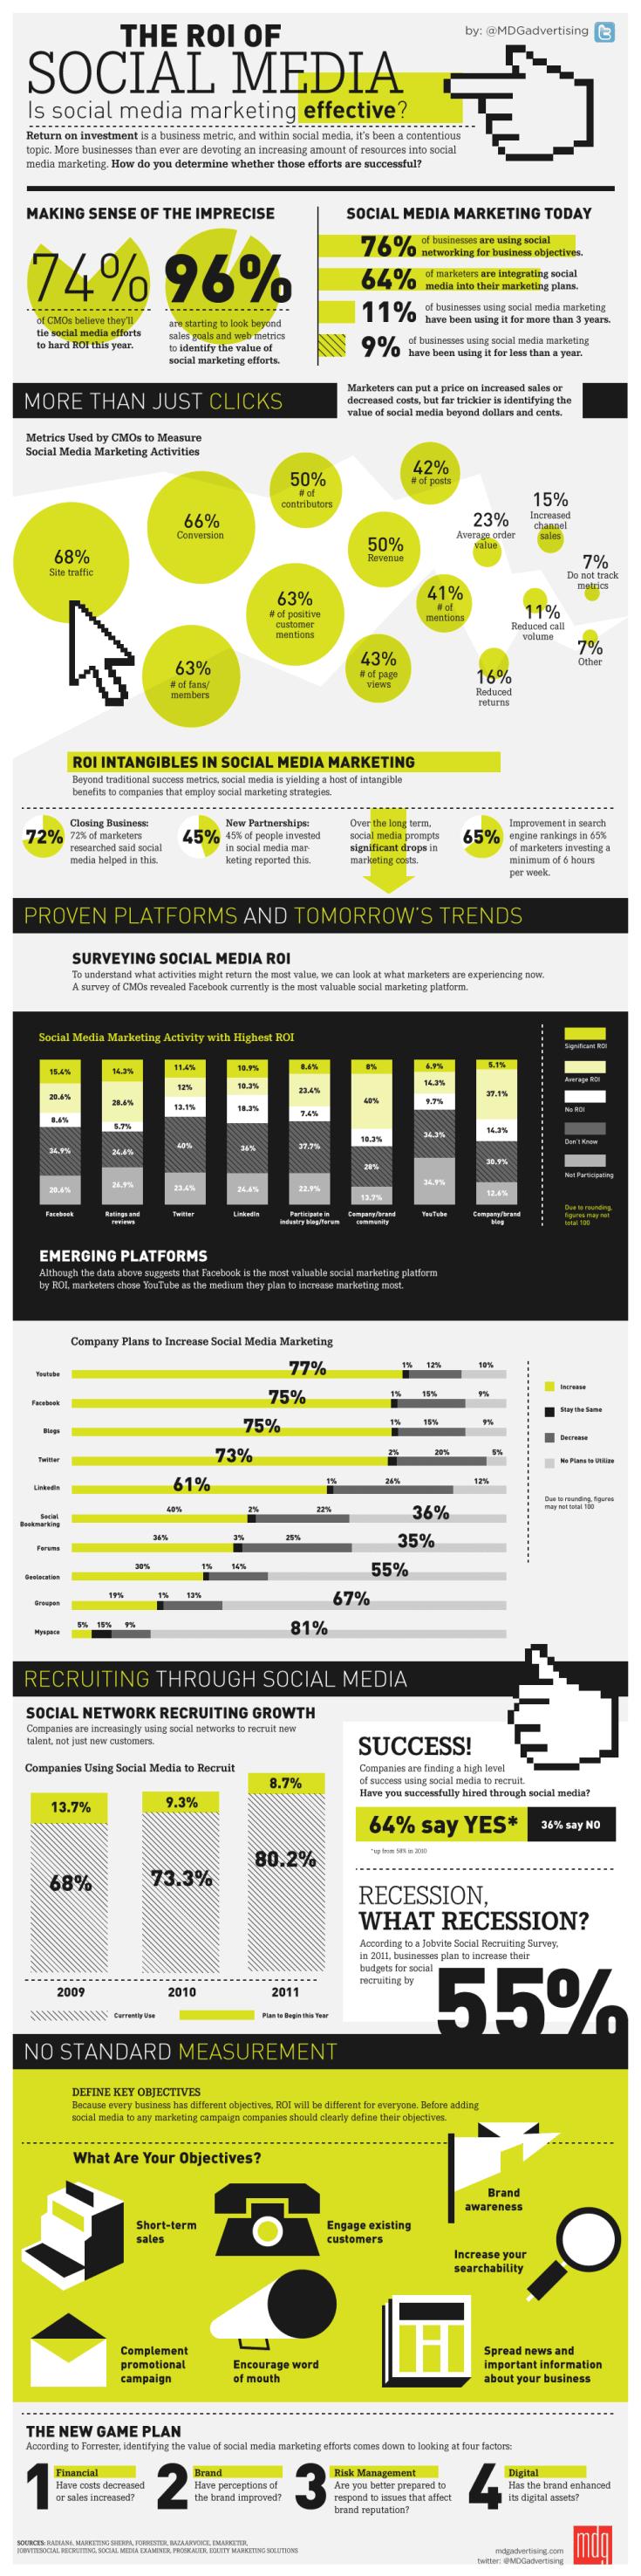 the_roi_of_social_media_mdg_advertising_infographic